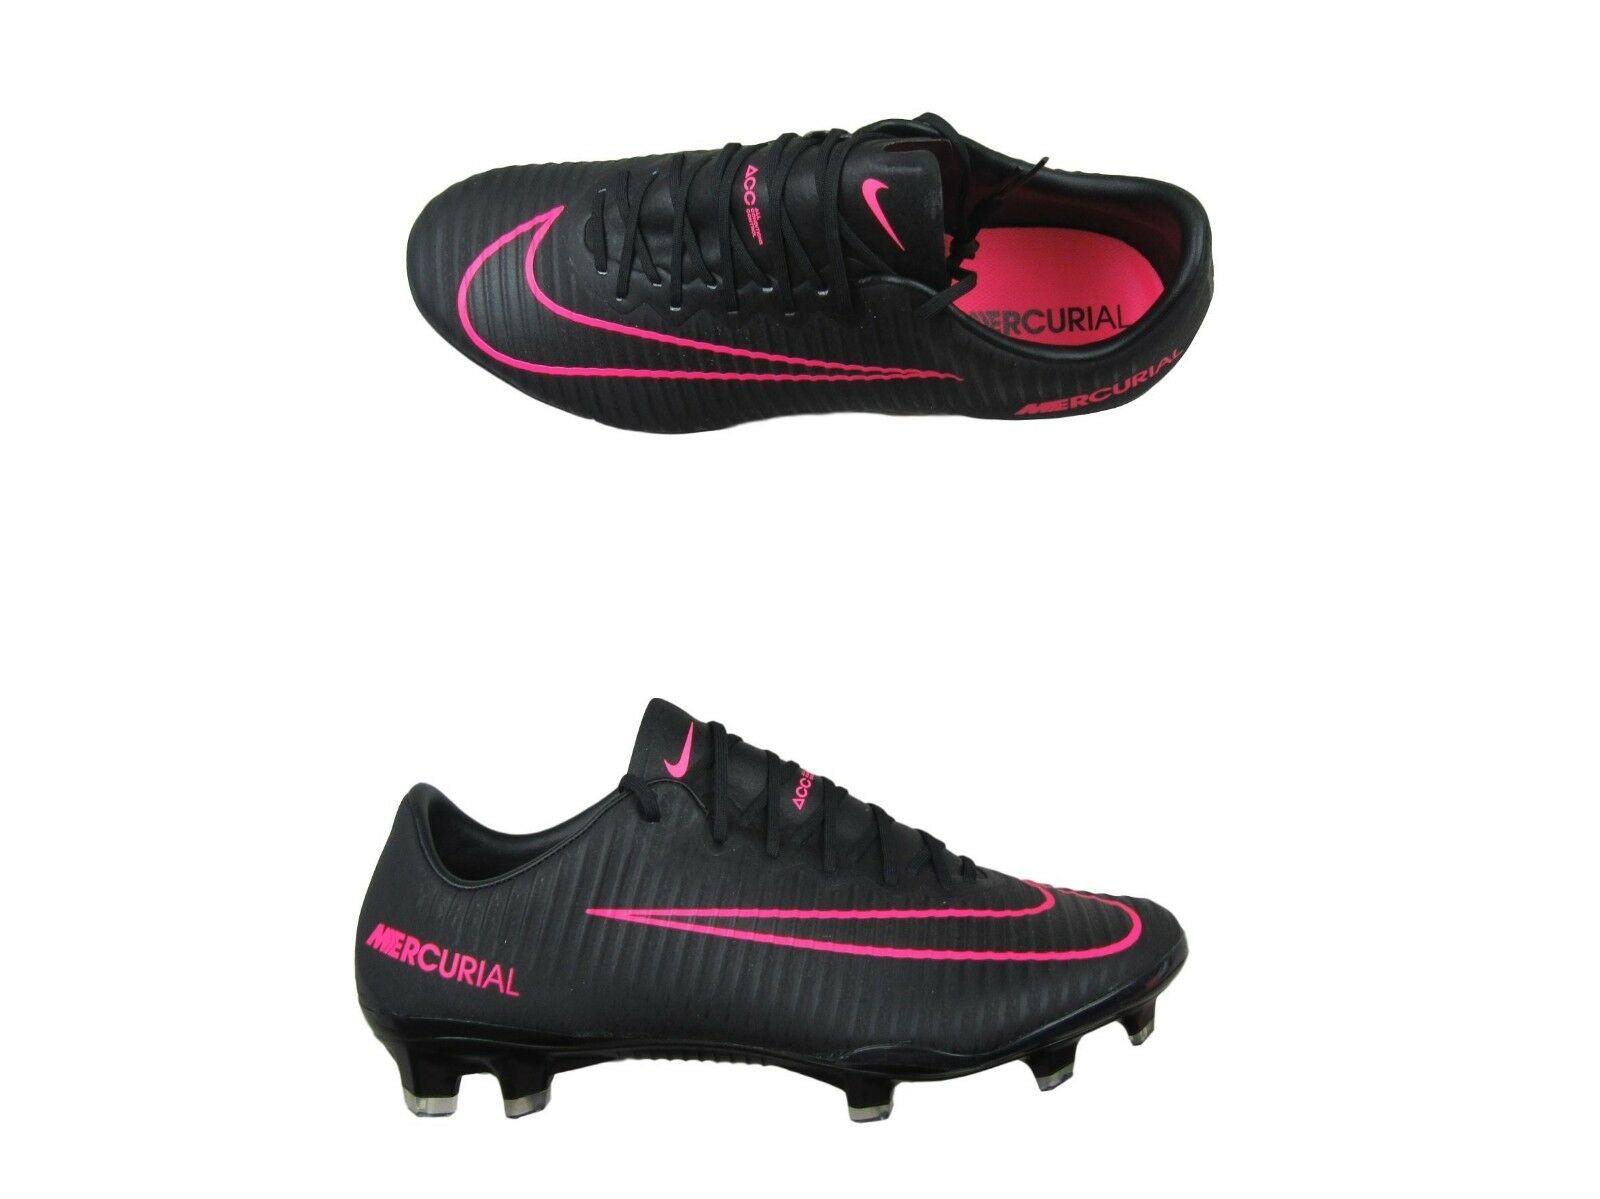 Nike Mercurial Vapor XI FG Size 8 Mens Soccer Cleats Black Pink ... 8579faf6ed68